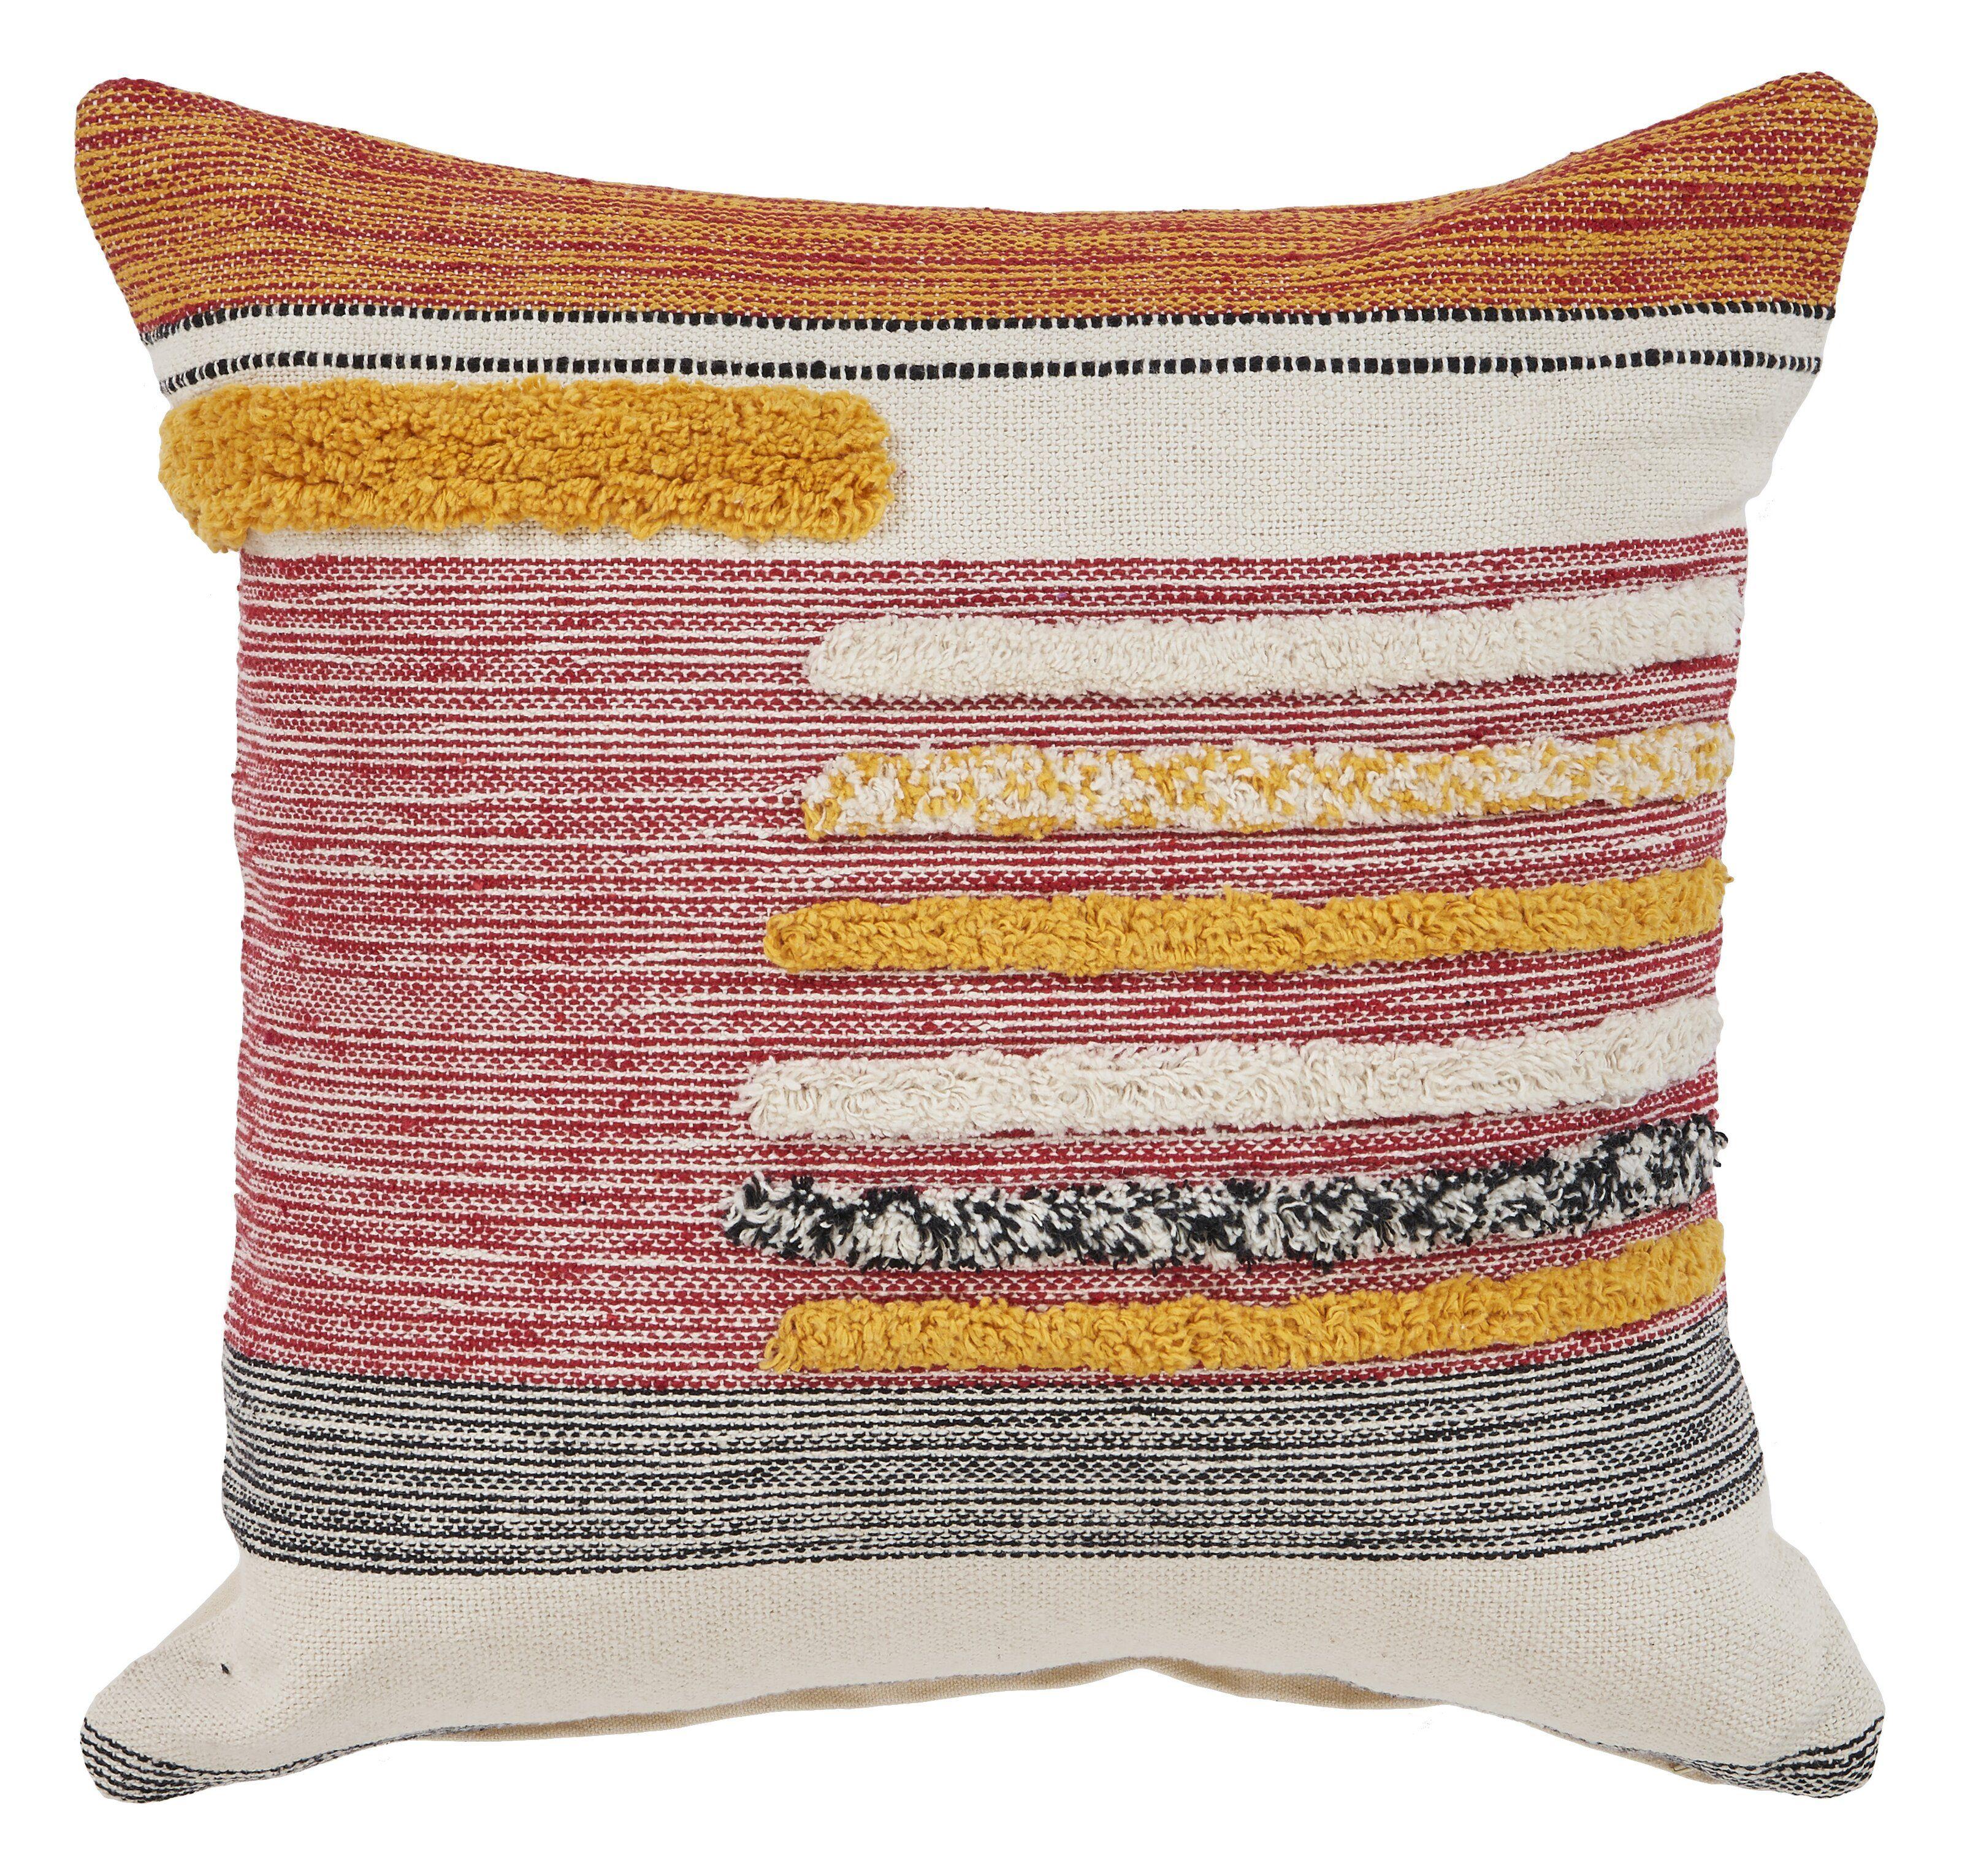 Adler Cotton Throw Pillow Cover Insert In 2021 Throw Pillows Modern Throw Pillows Textured Throw Pillows